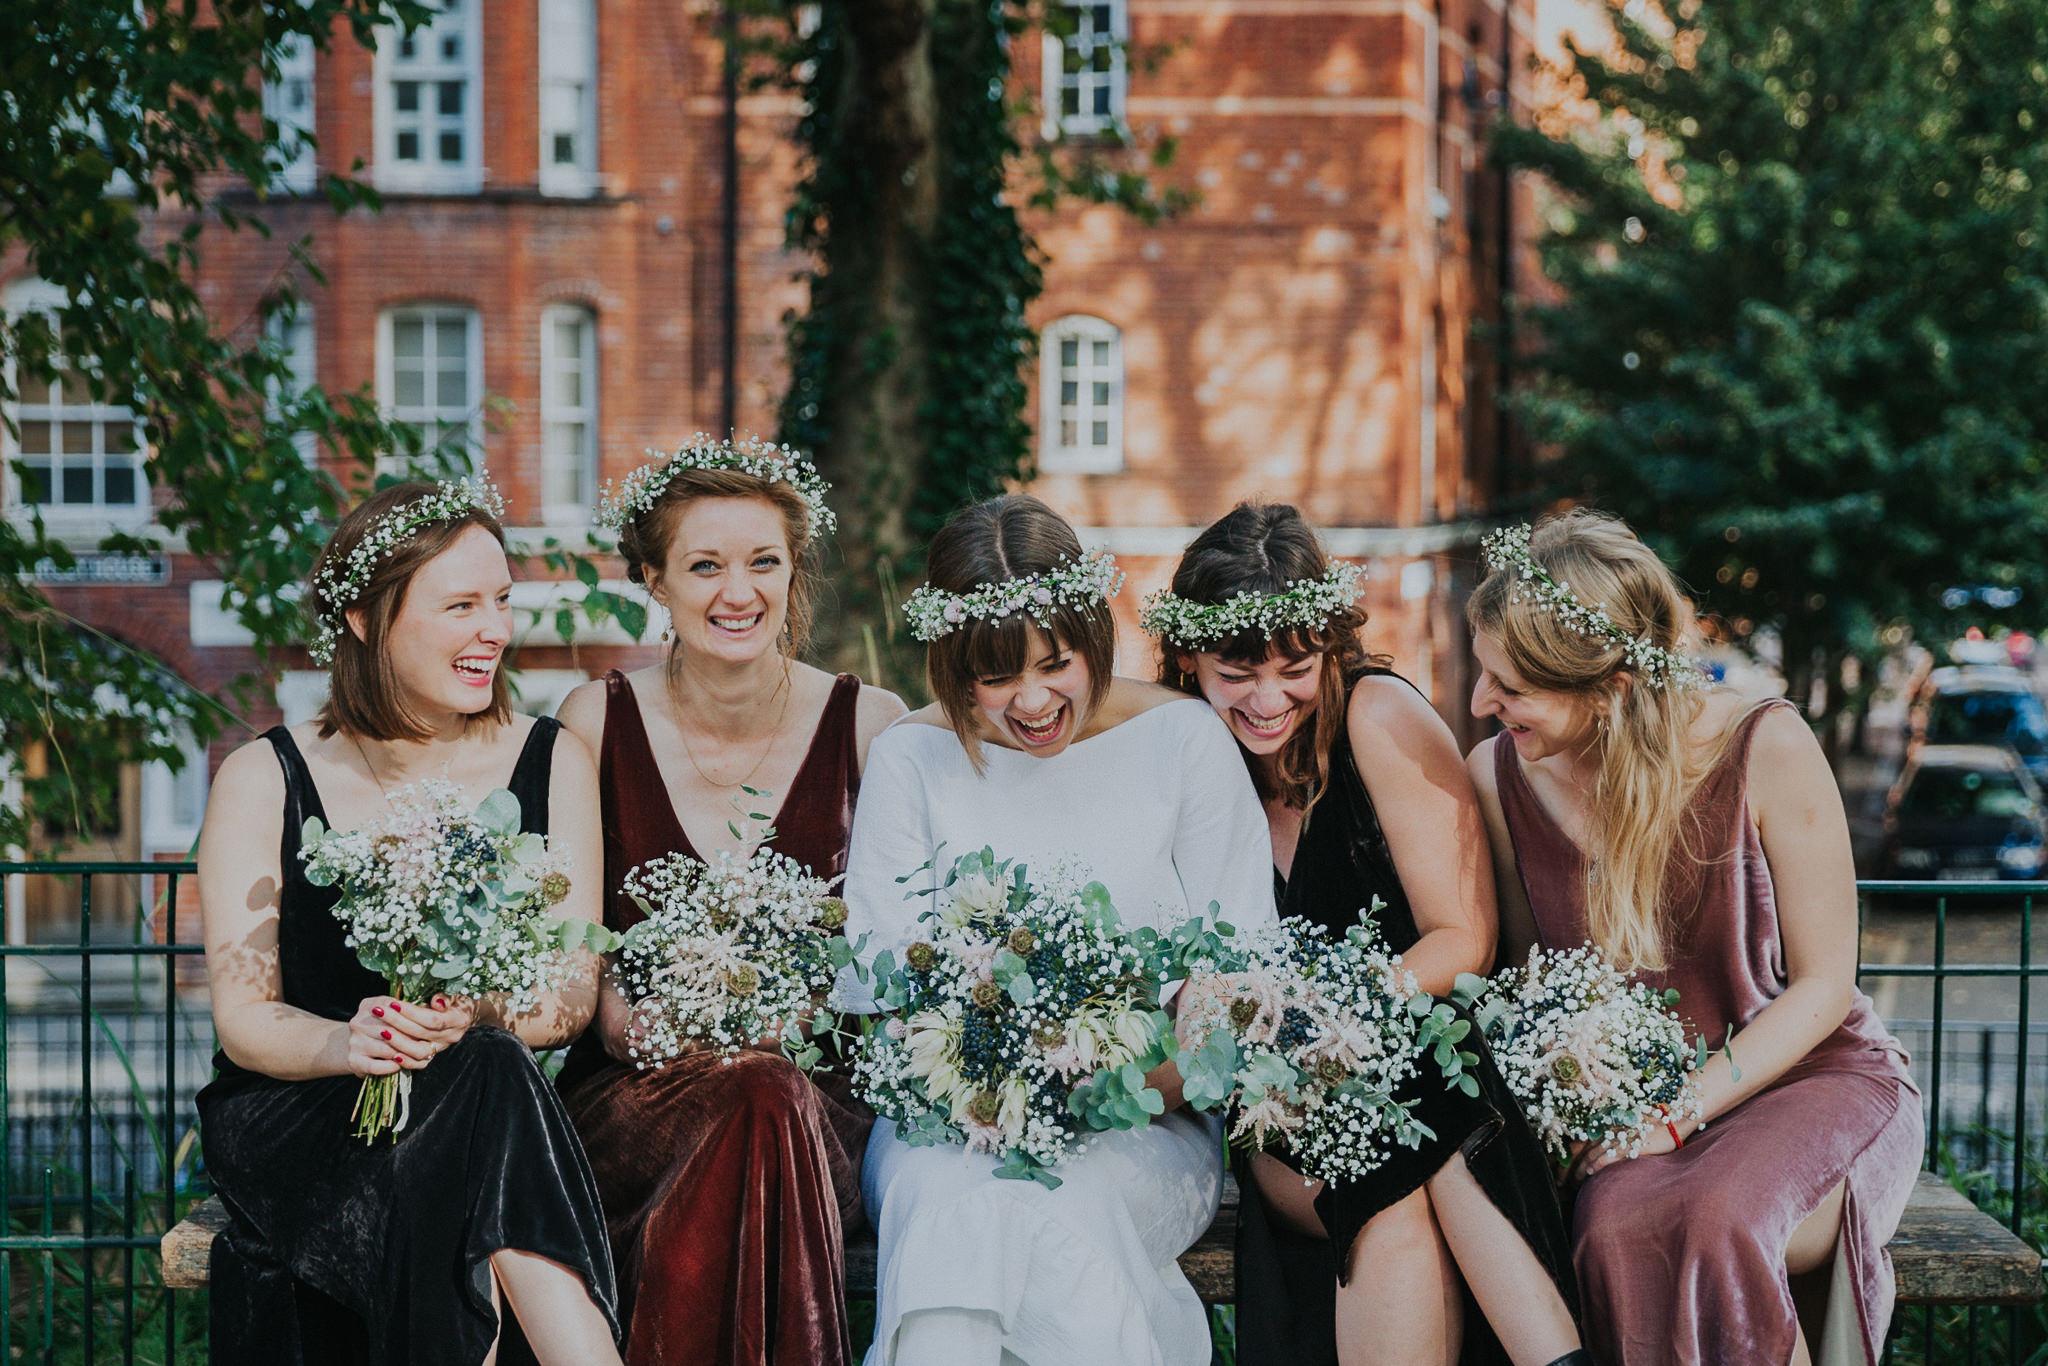 kate-gray-london-wedding-photography-46.jpg